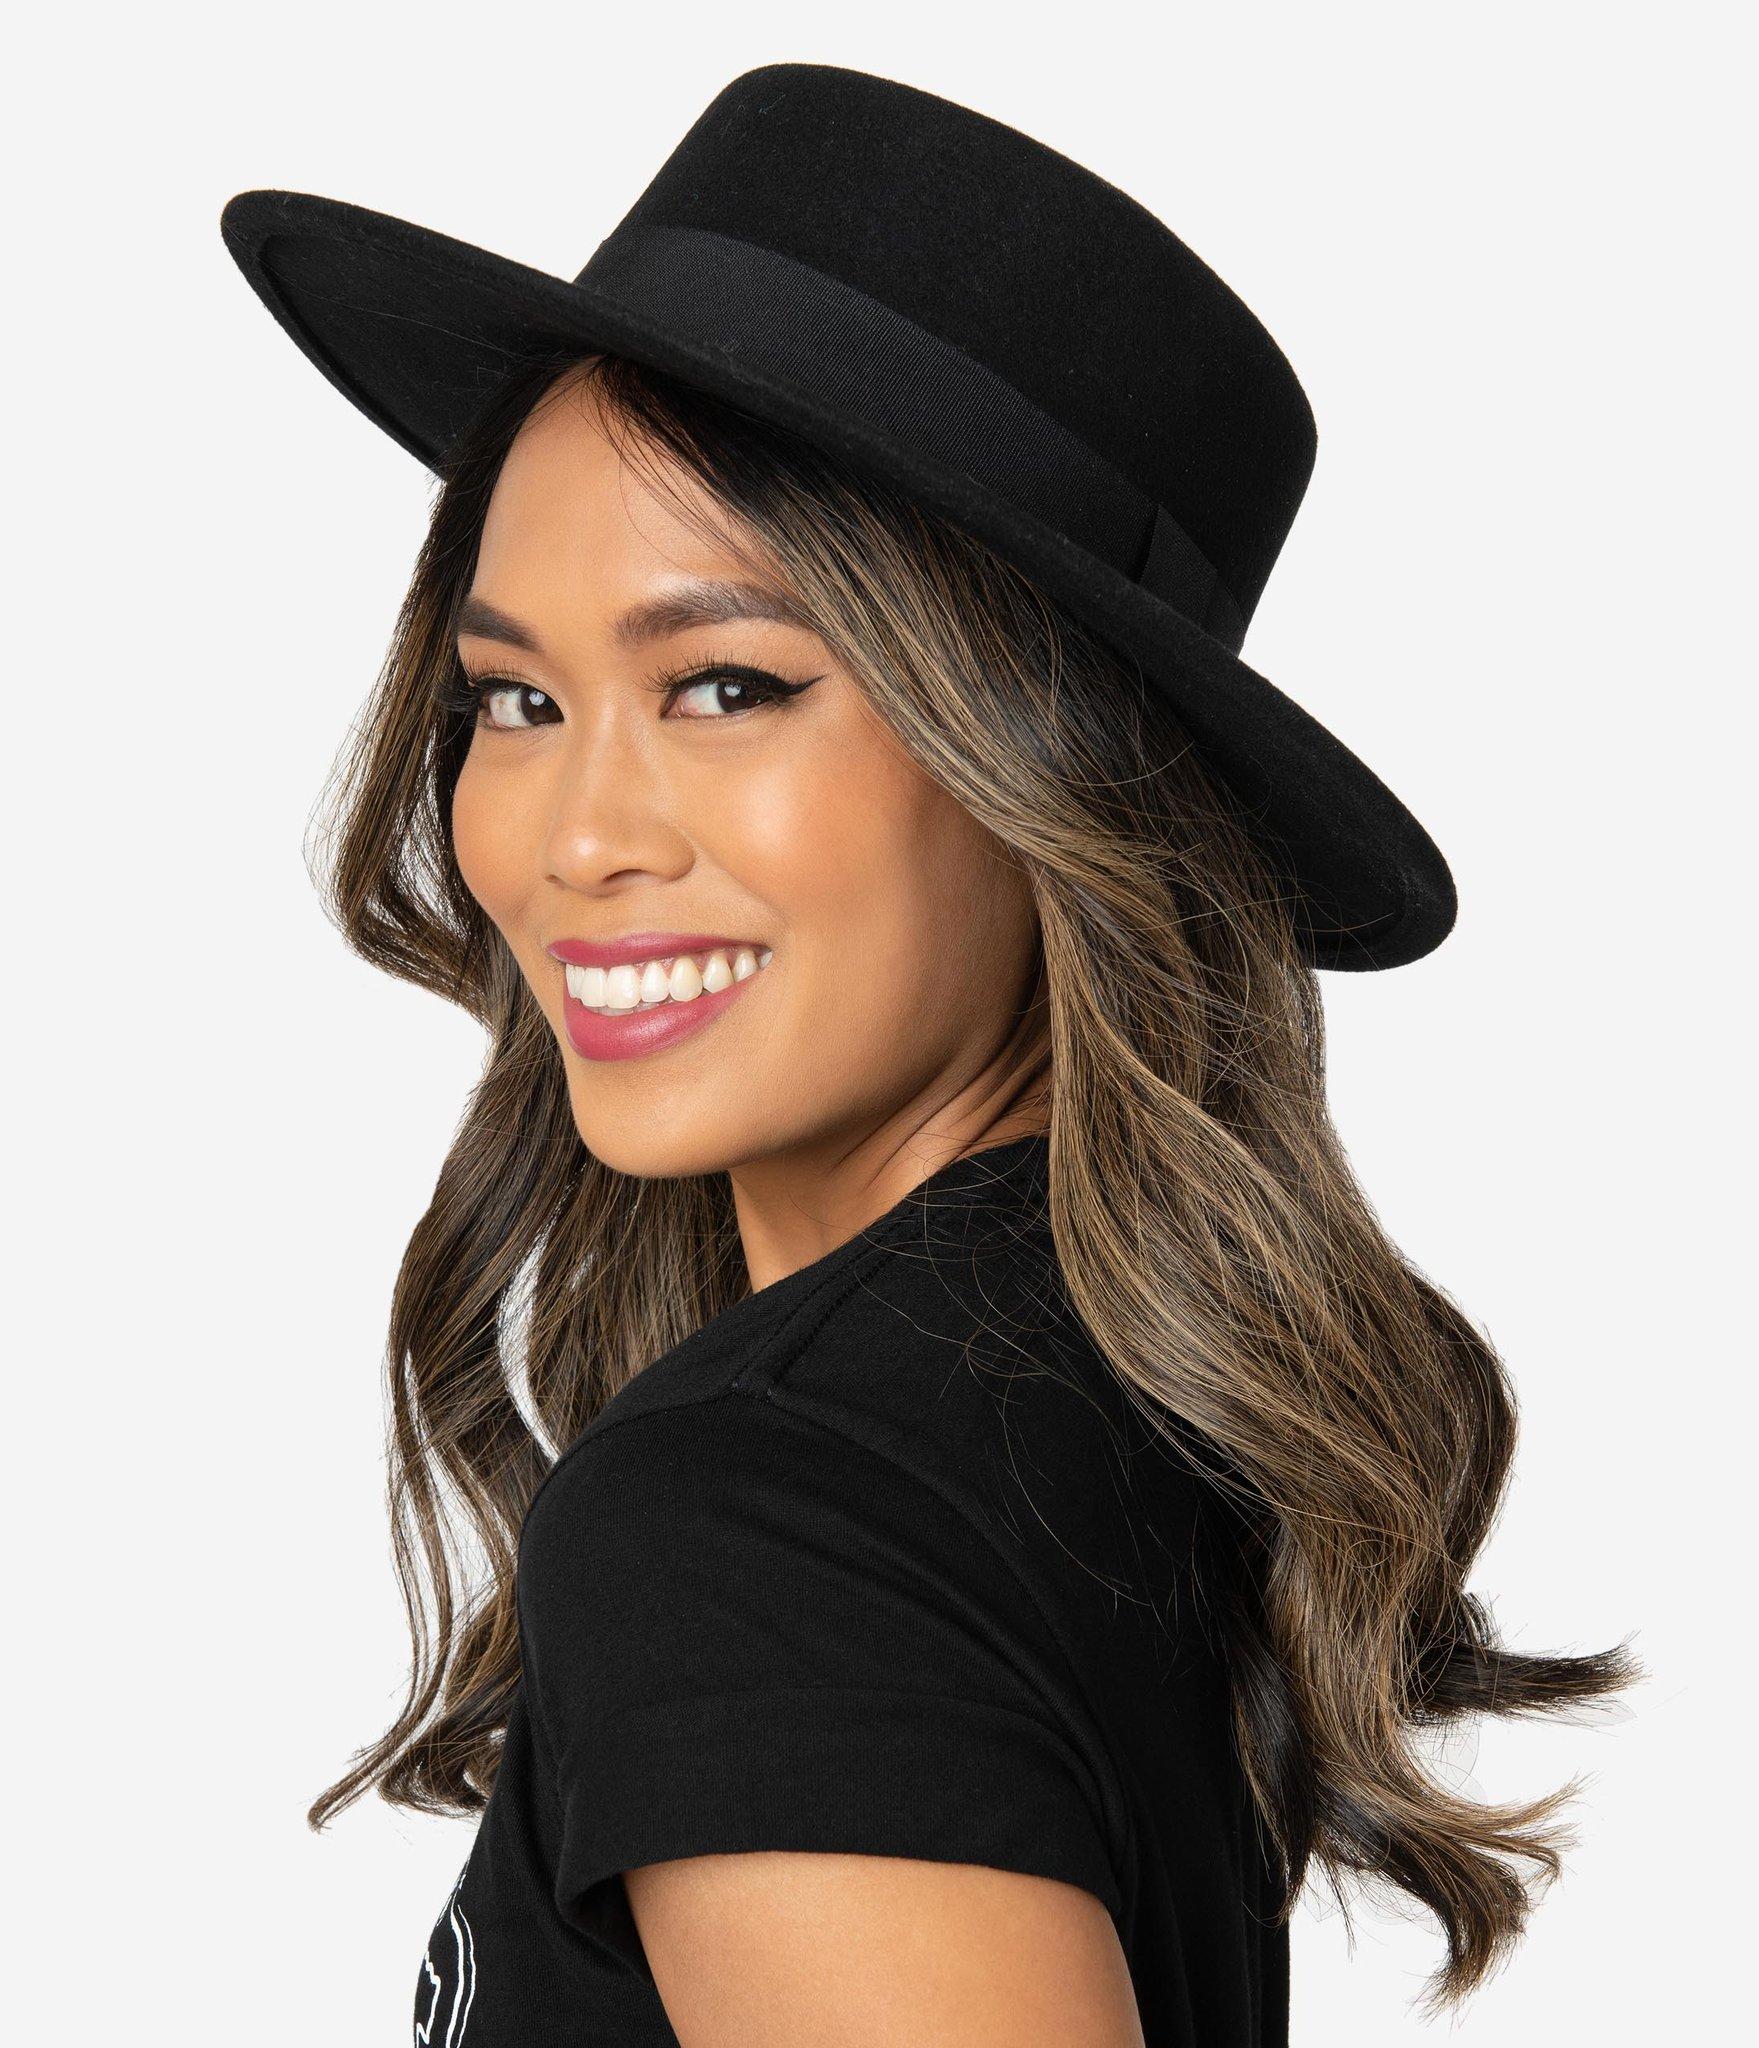 Unique Vintage Black Wool Felt Bolero Hat - Spooky Style